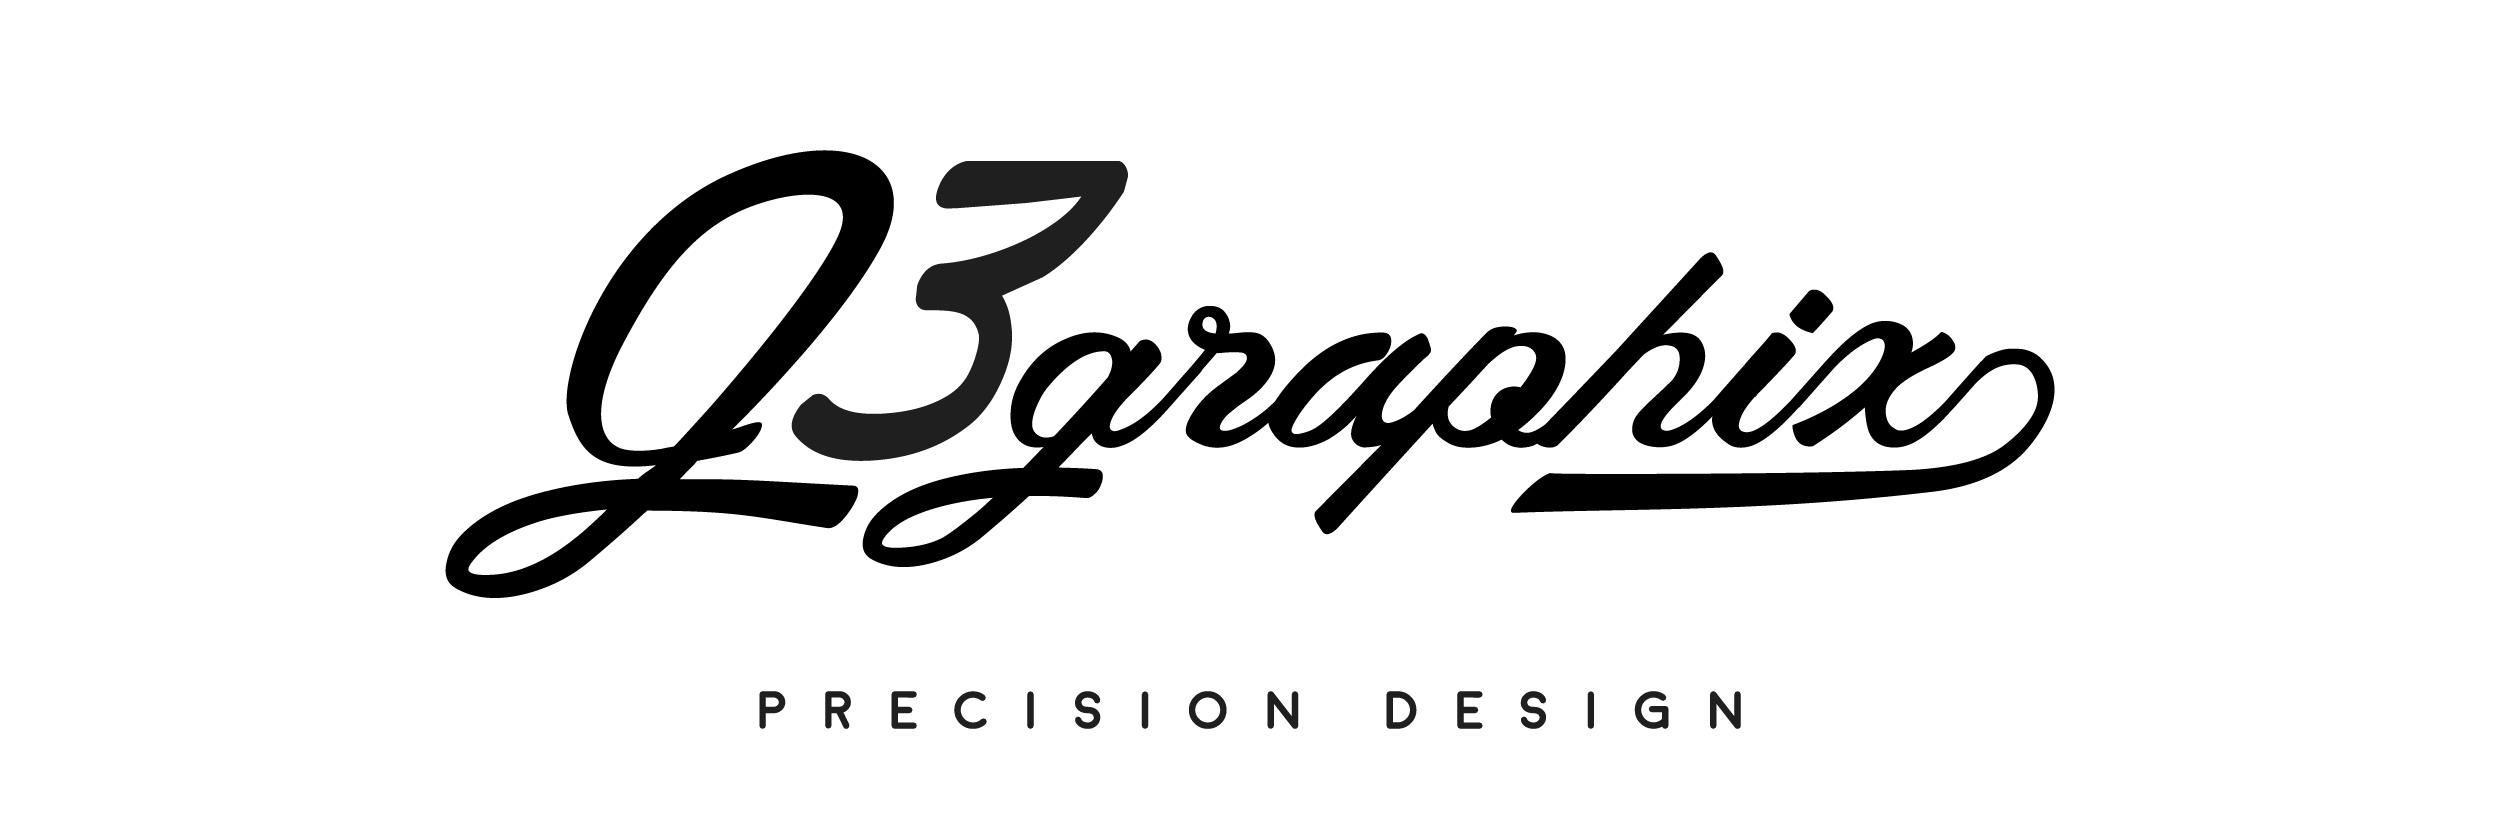 J3Graphix